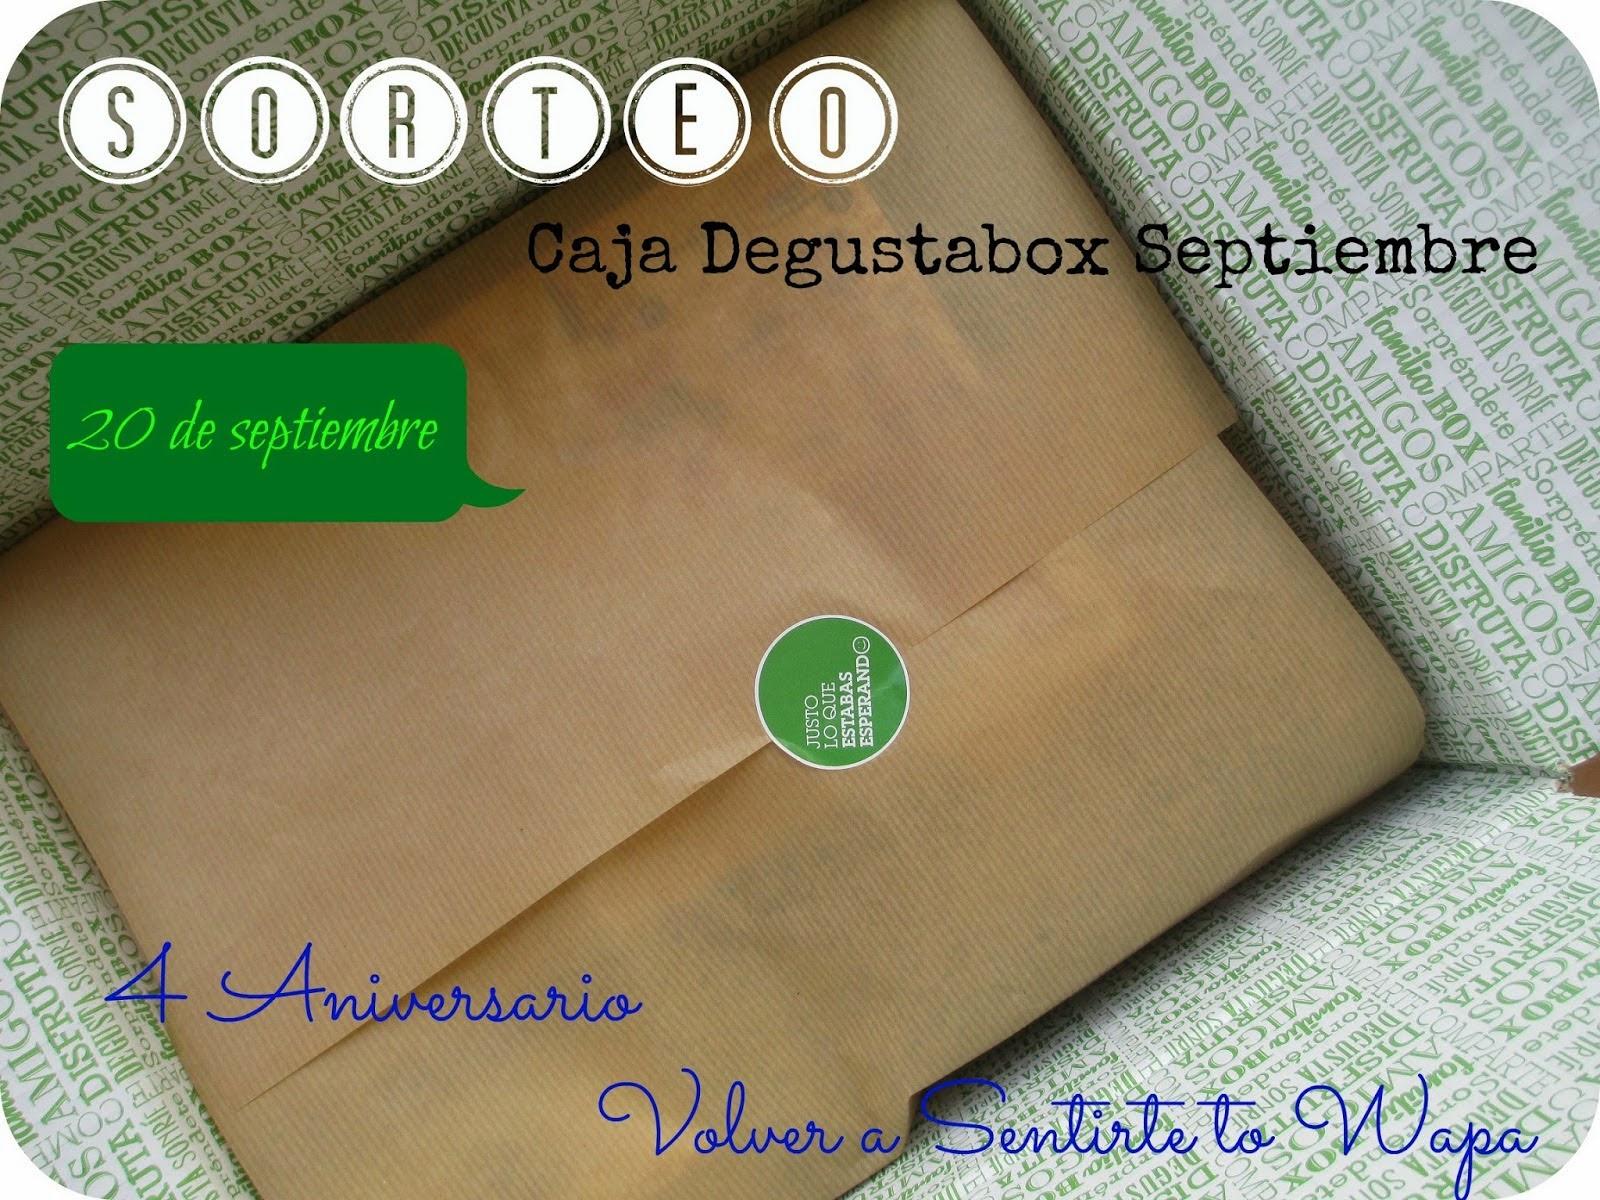 SORTEO EXPRESS - DEGUSTABOX SEPTIEMBRE